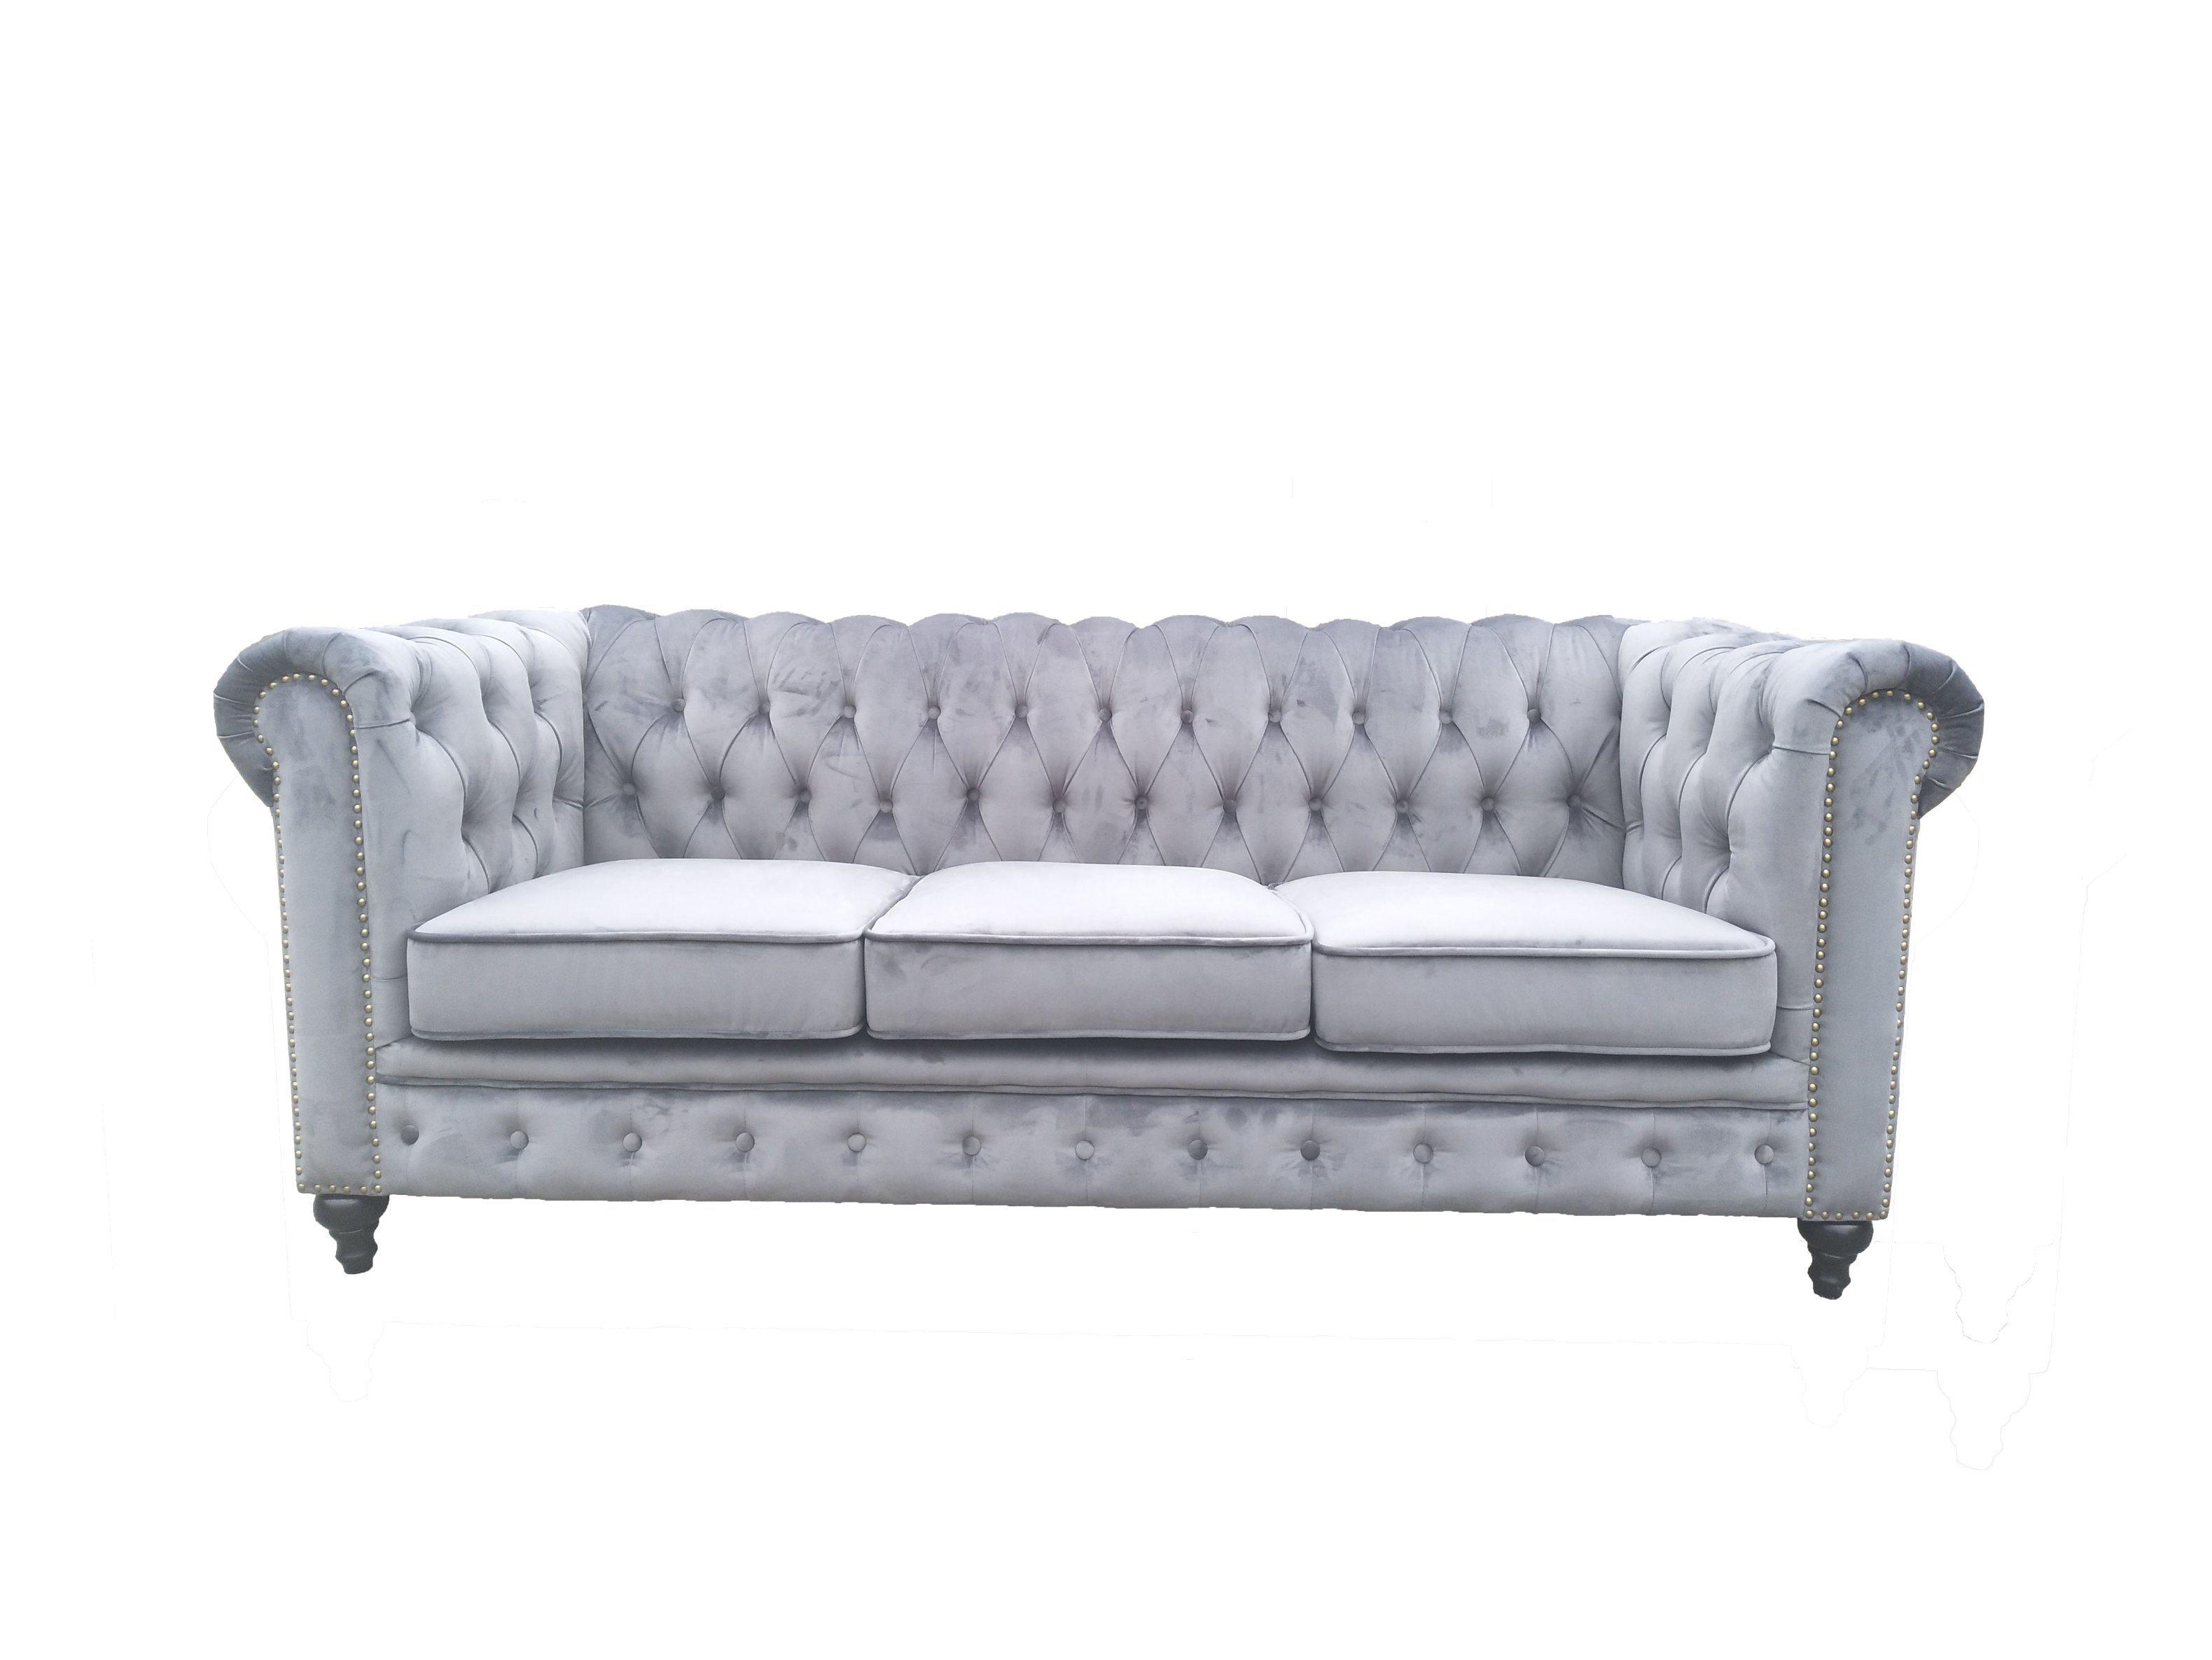 Superbe [Hot Item] Popular Modern Chesterfield Fabric Sofa Set For Living Room